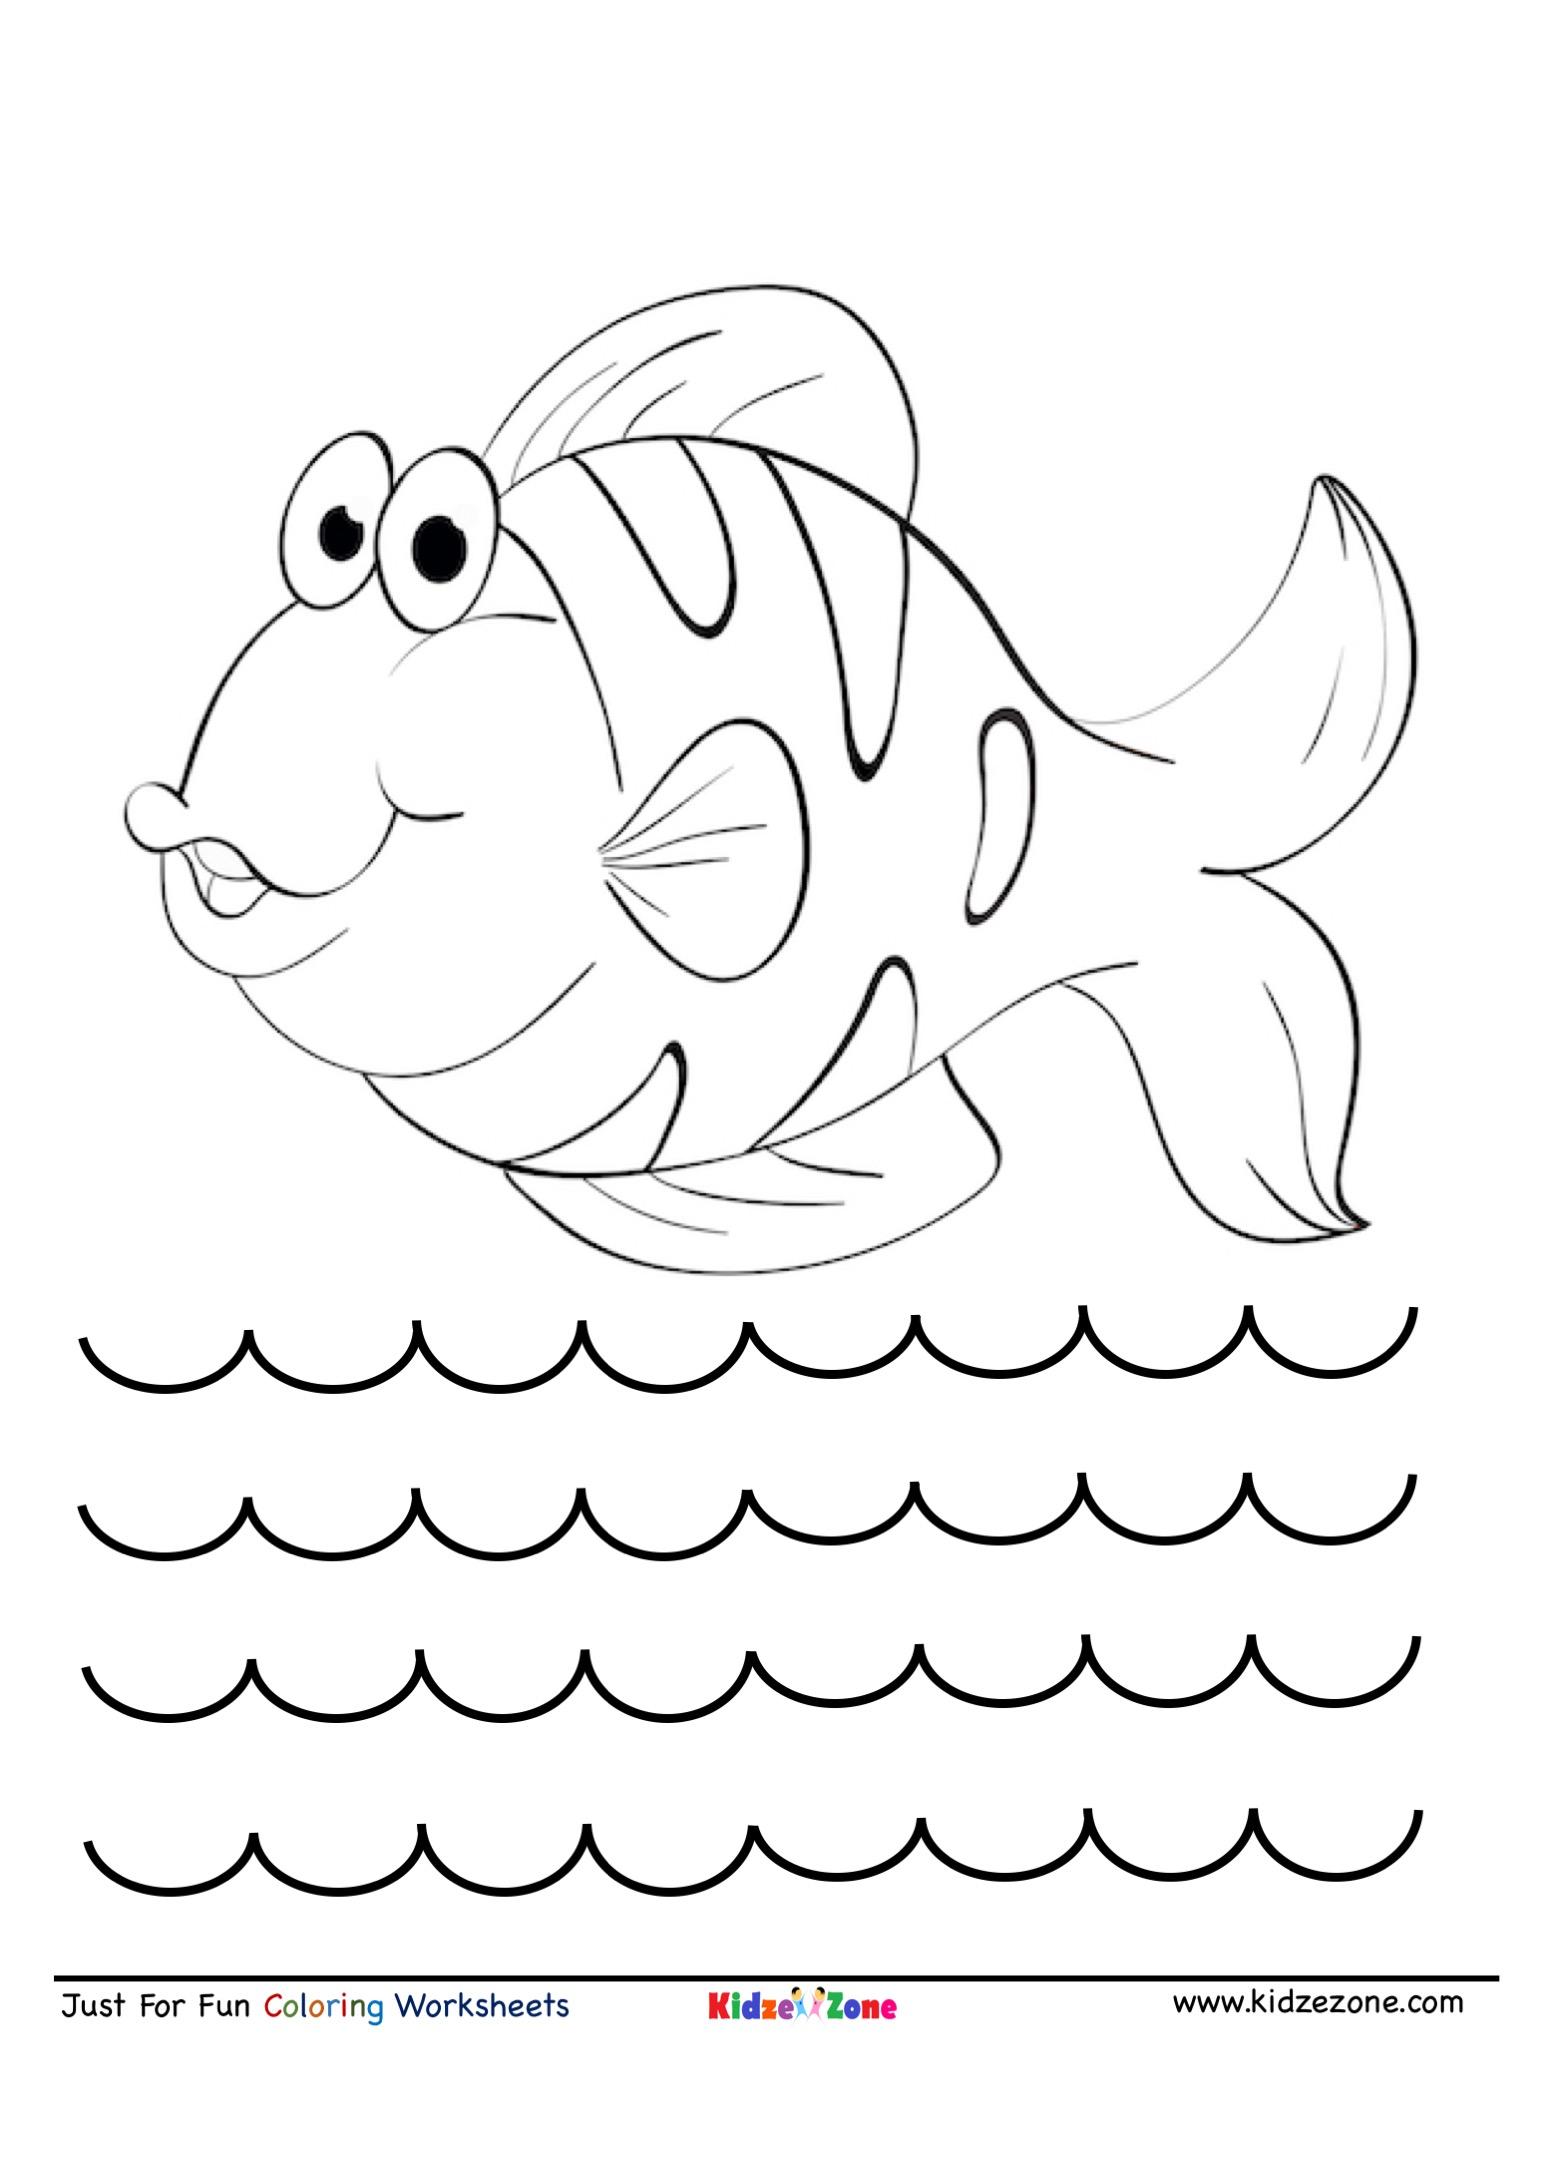 Smiling Fish Cartoon Coloring Page